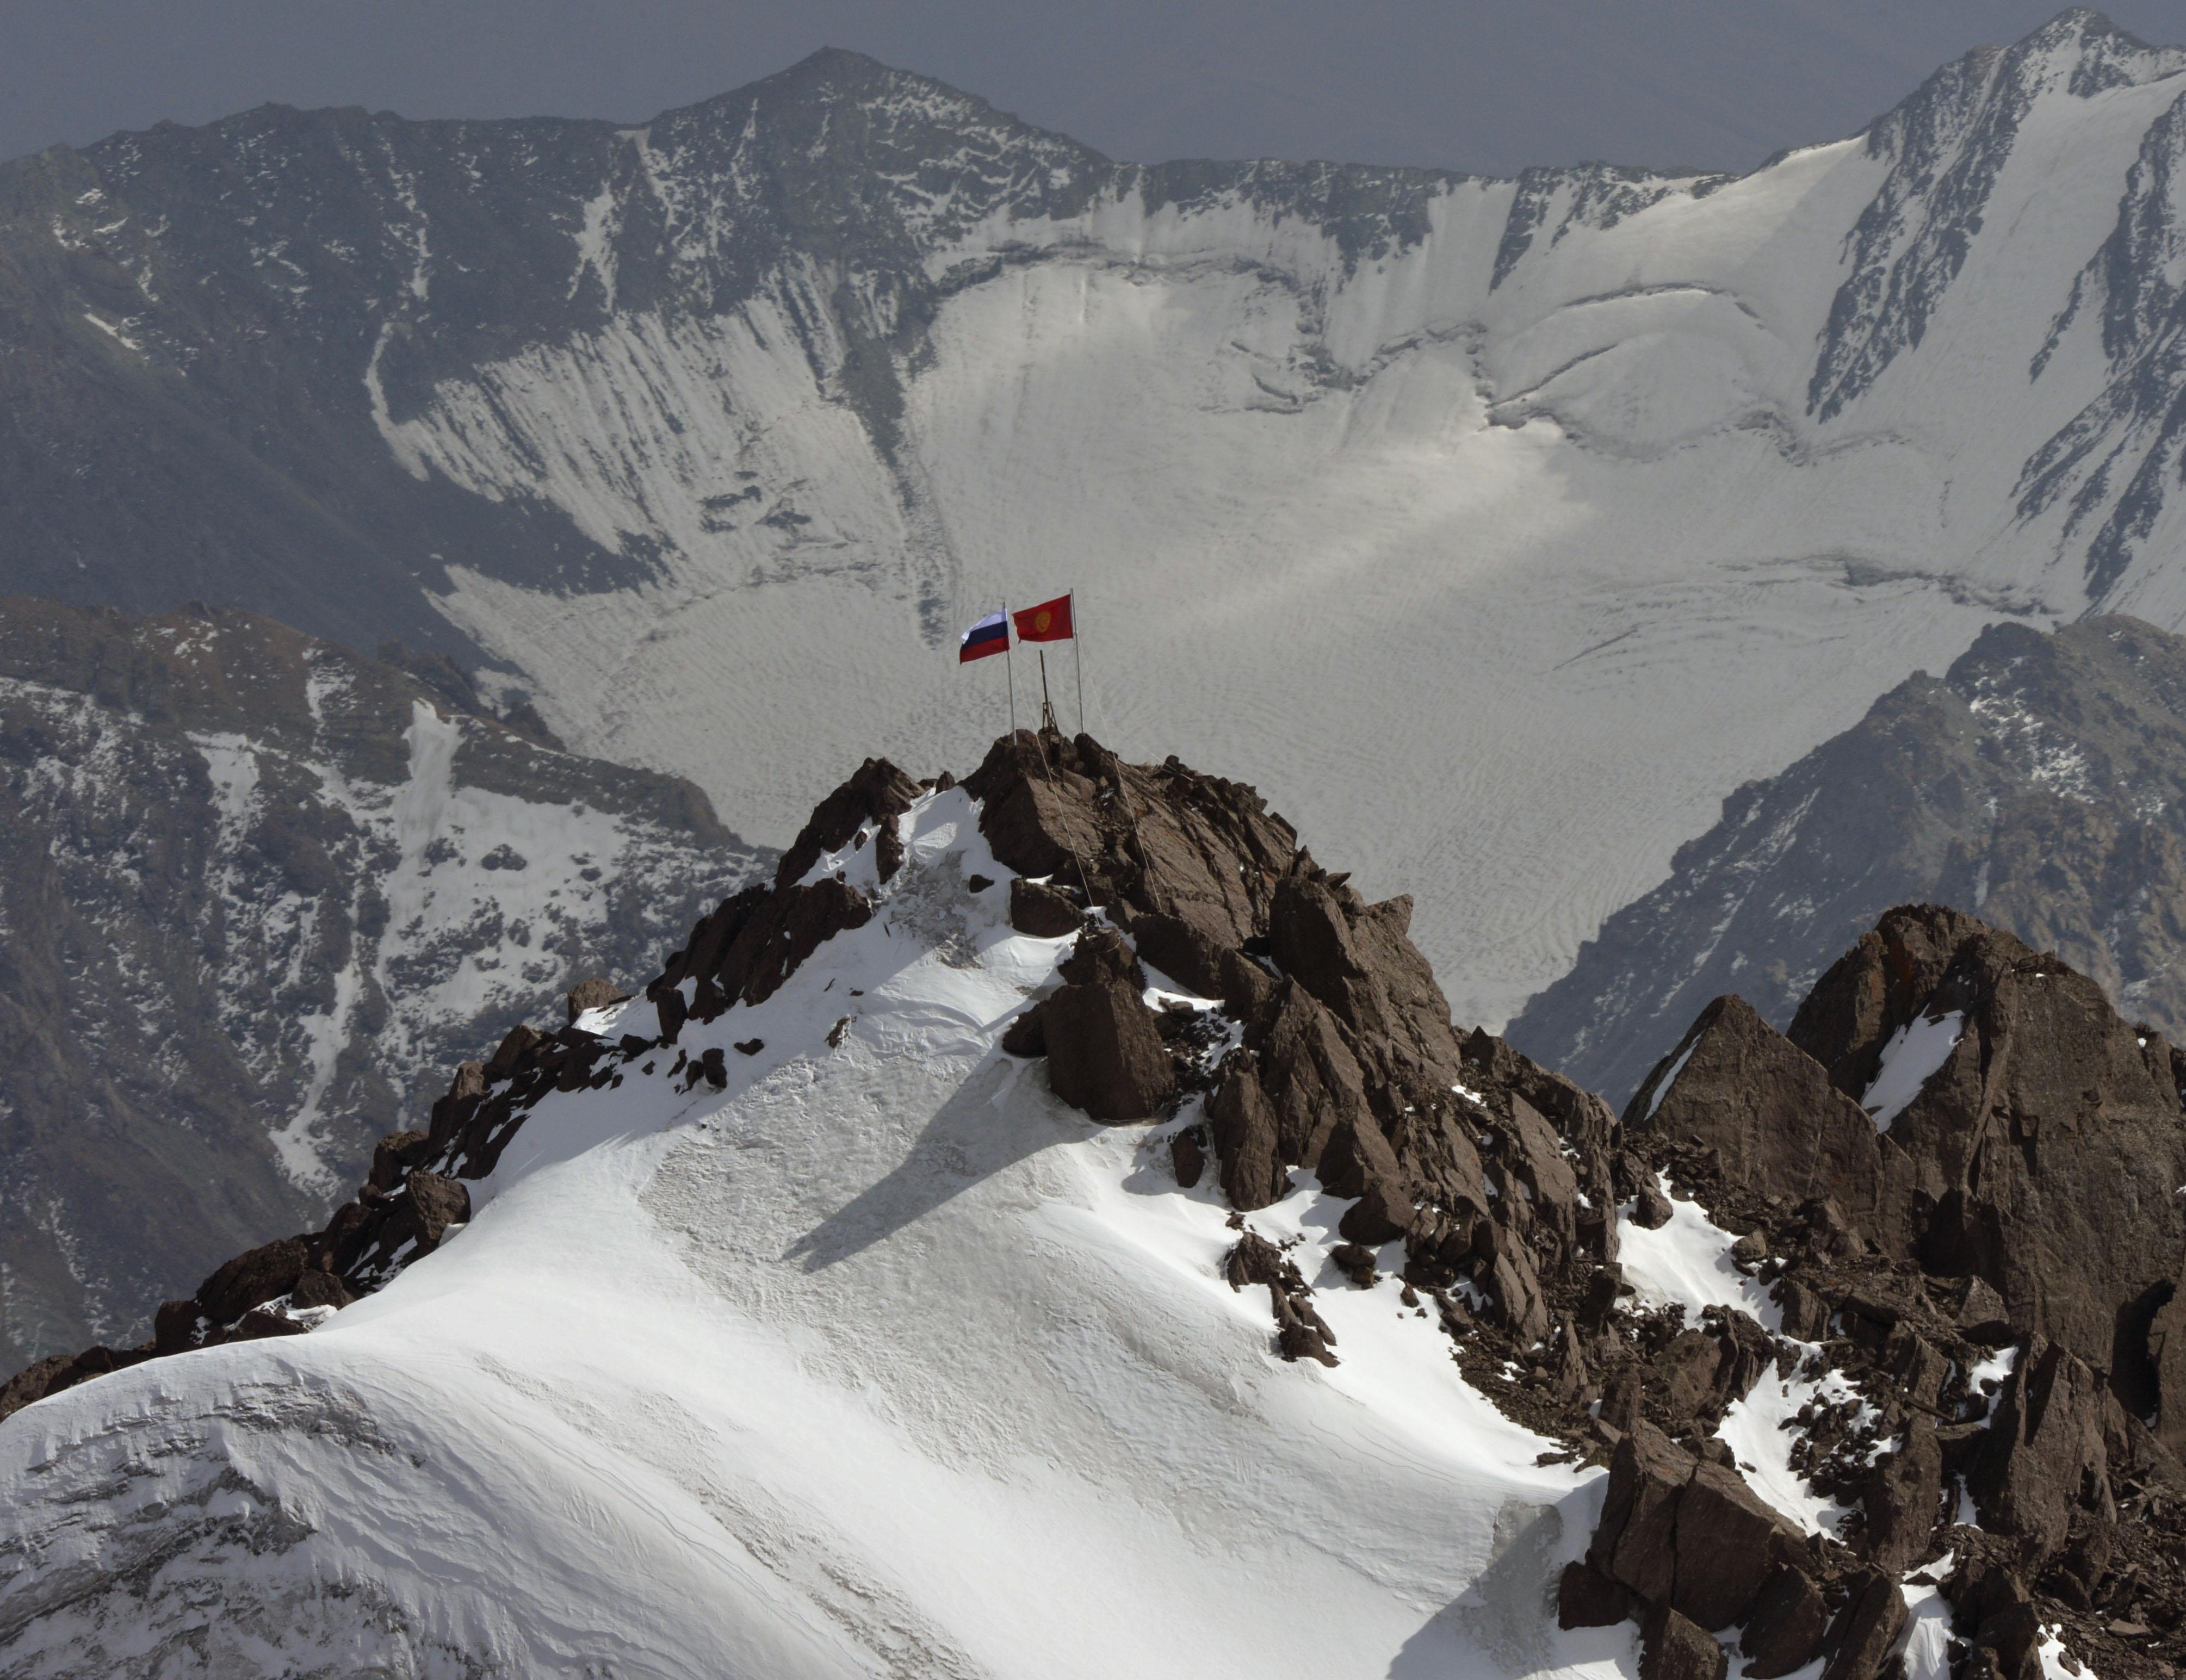 High Vladimir Putin Peak In The Tian Shan Mountain Nows أخبار العالم